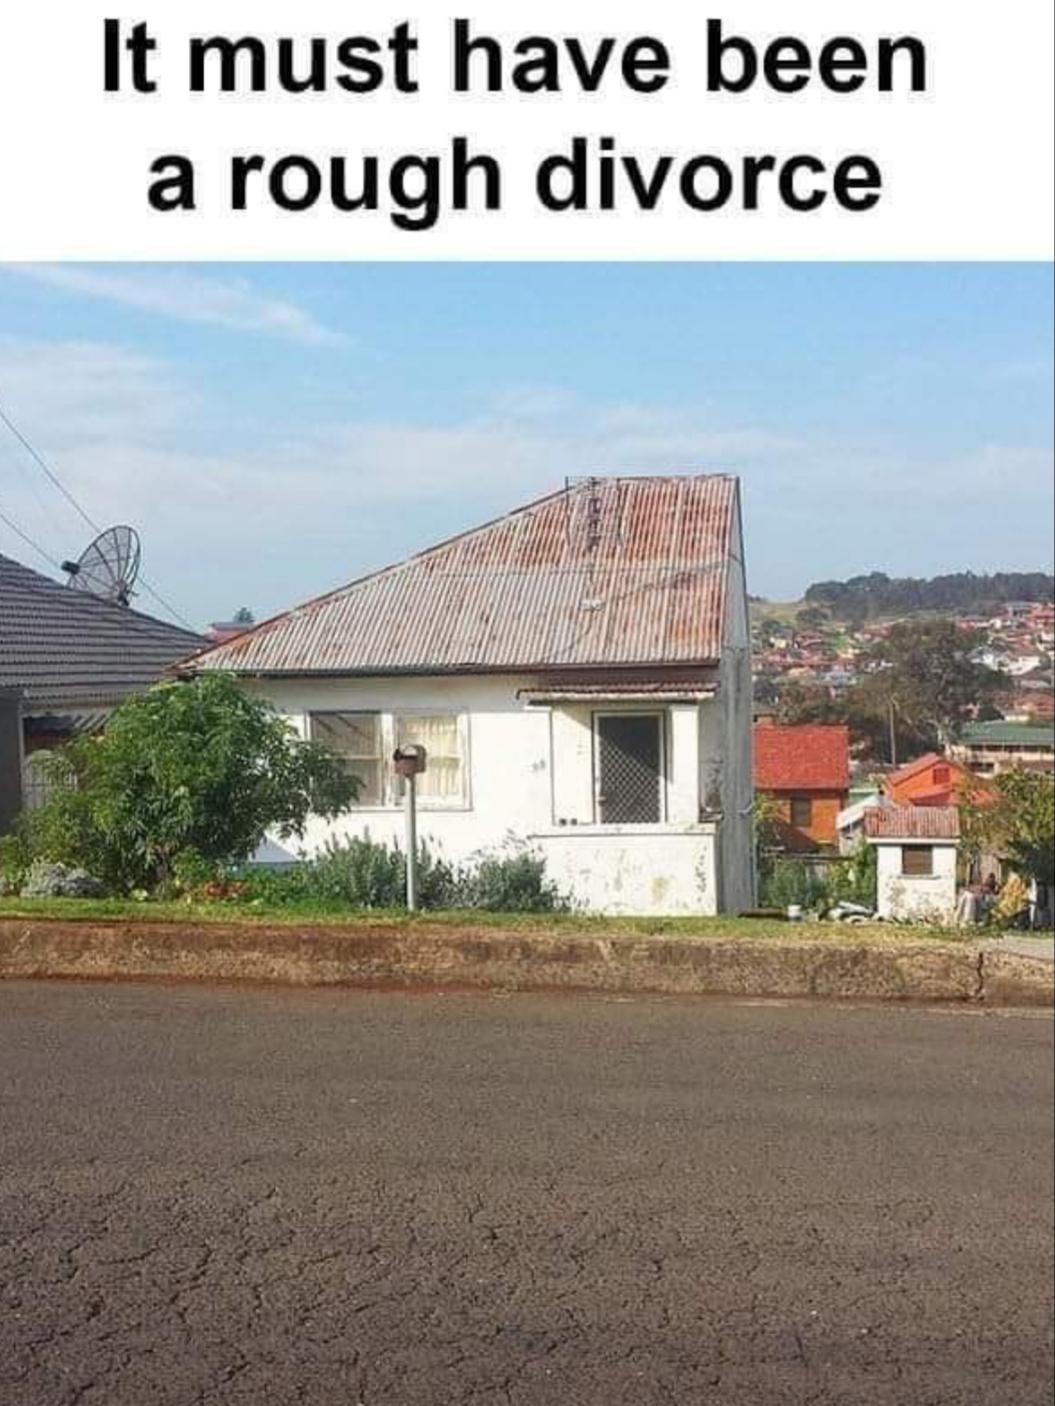 Rough Divorce